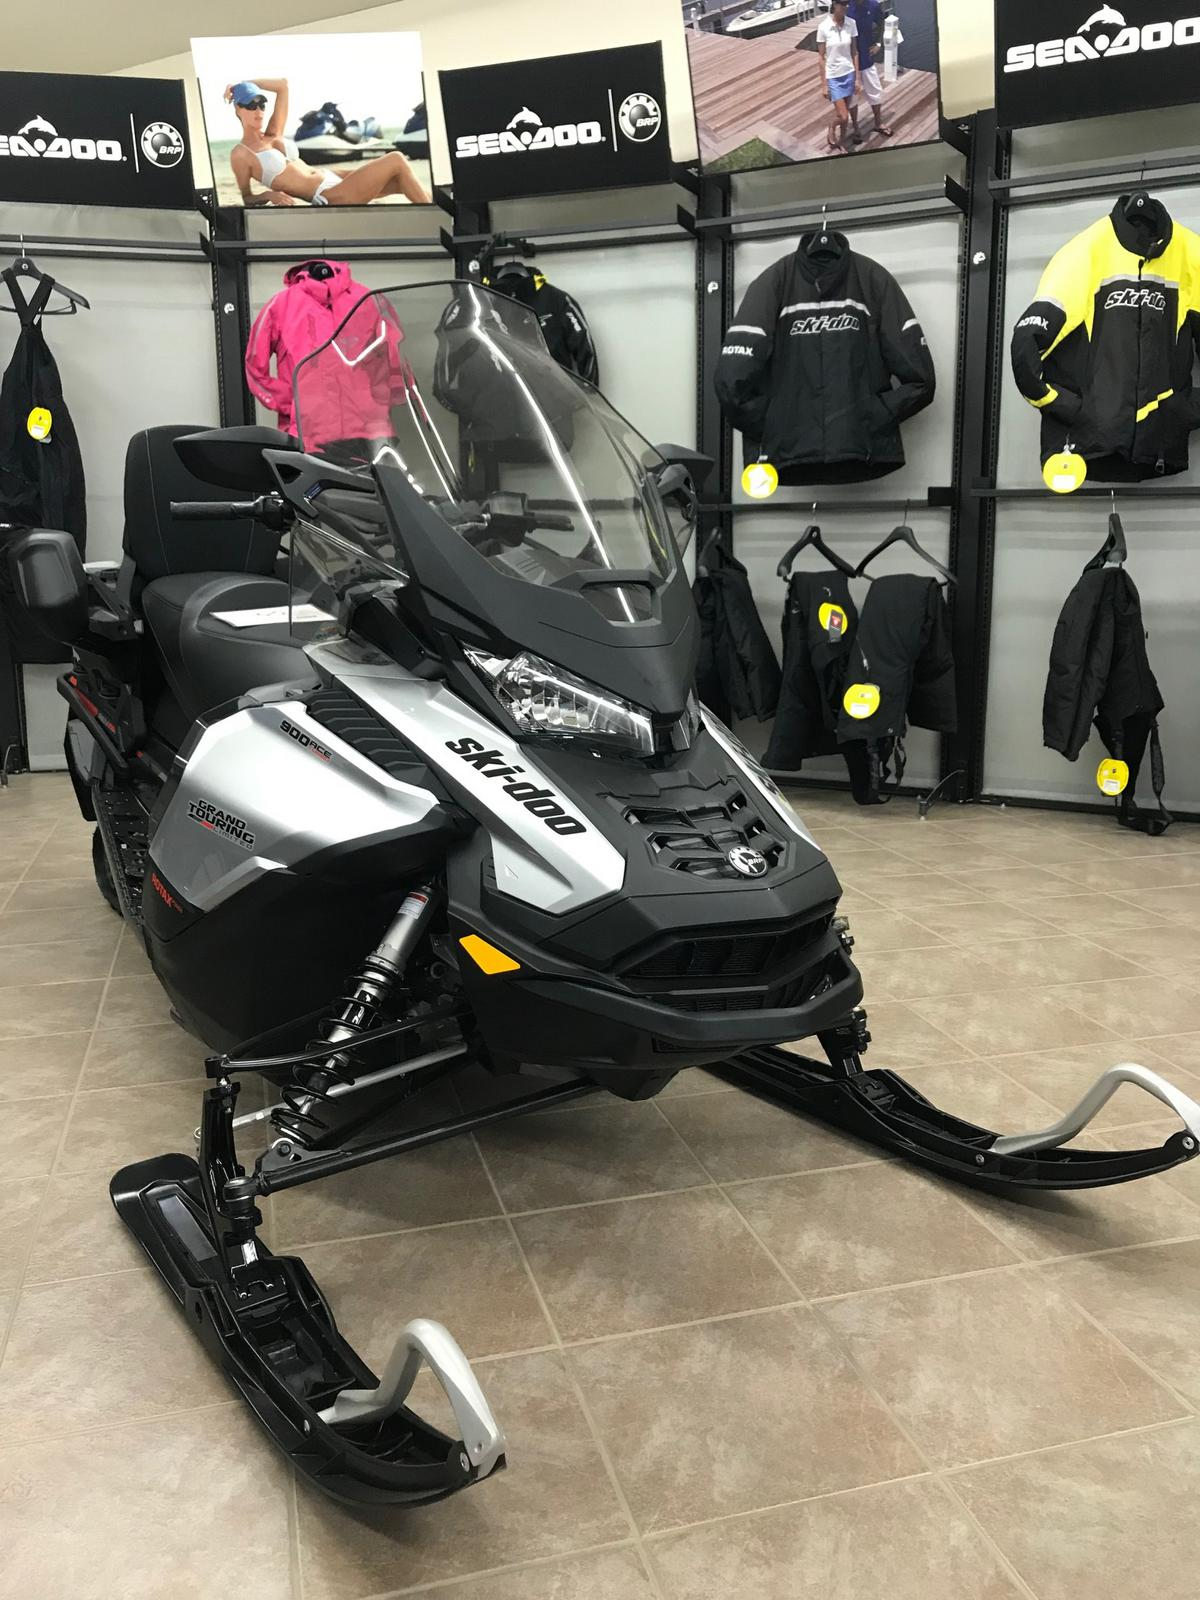 2019 Ski-Doo Grand Touring Ltd  900 ACE Turbo E-Start